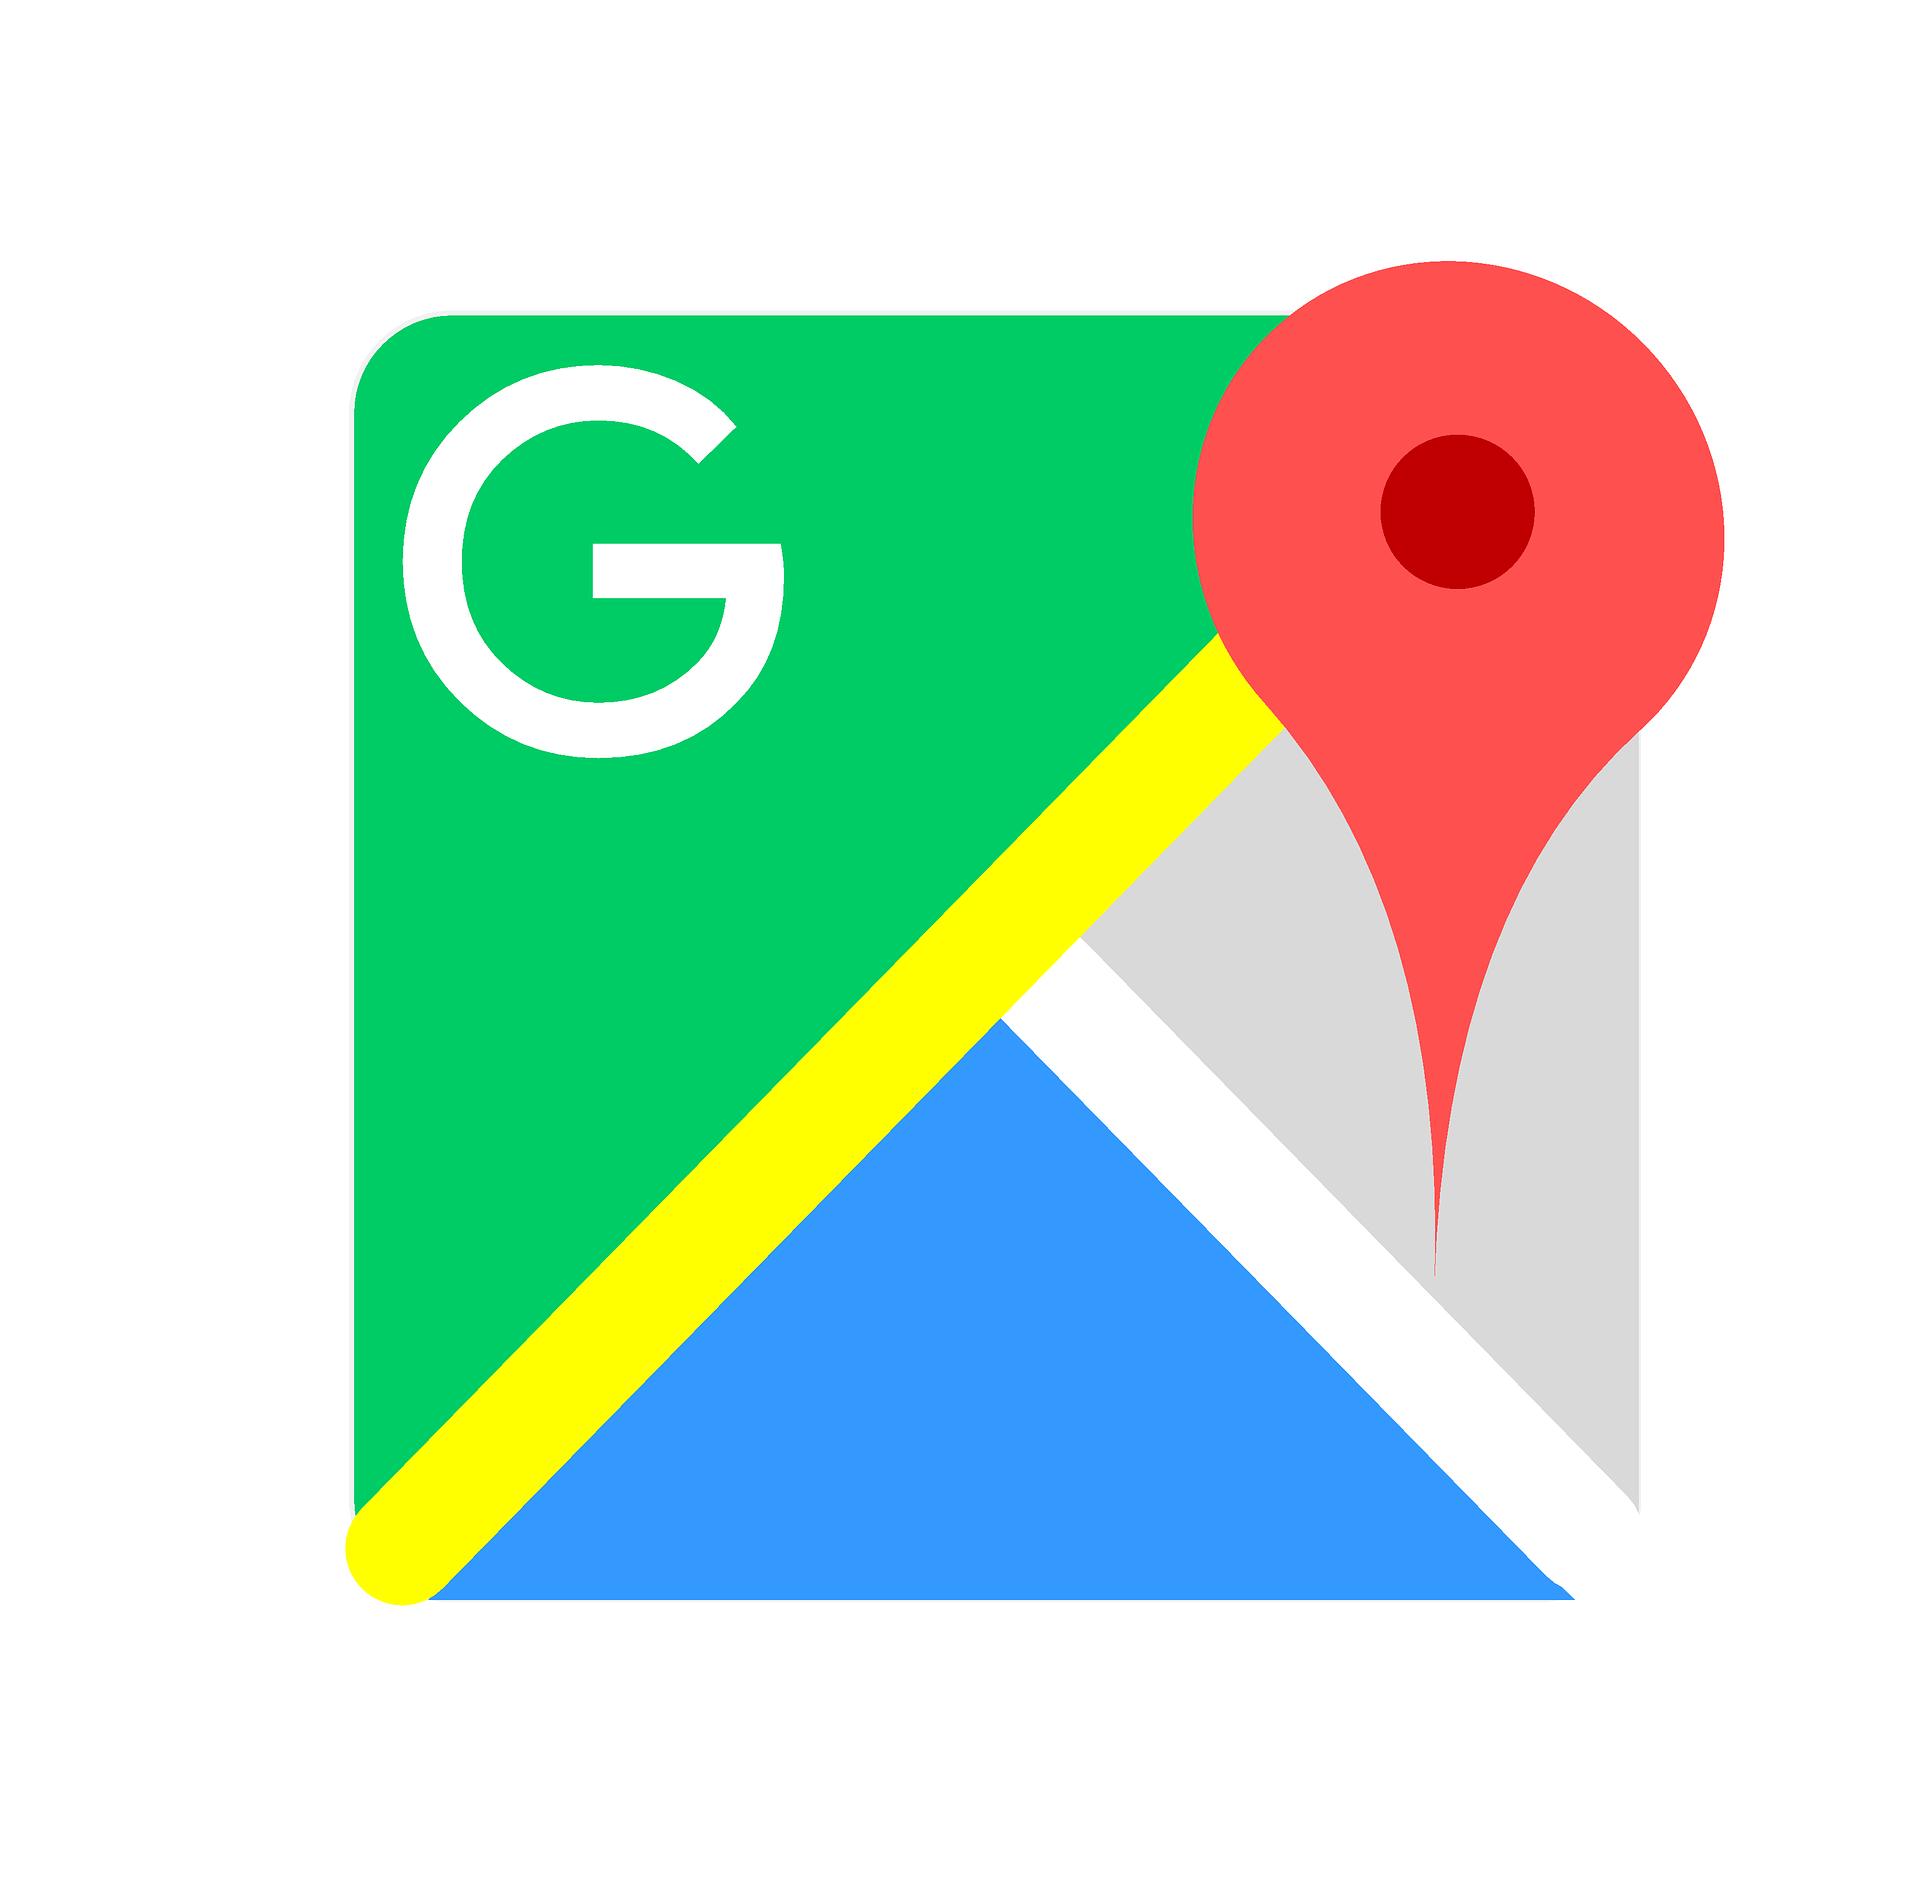 como posicionar en Google maps tu empresa